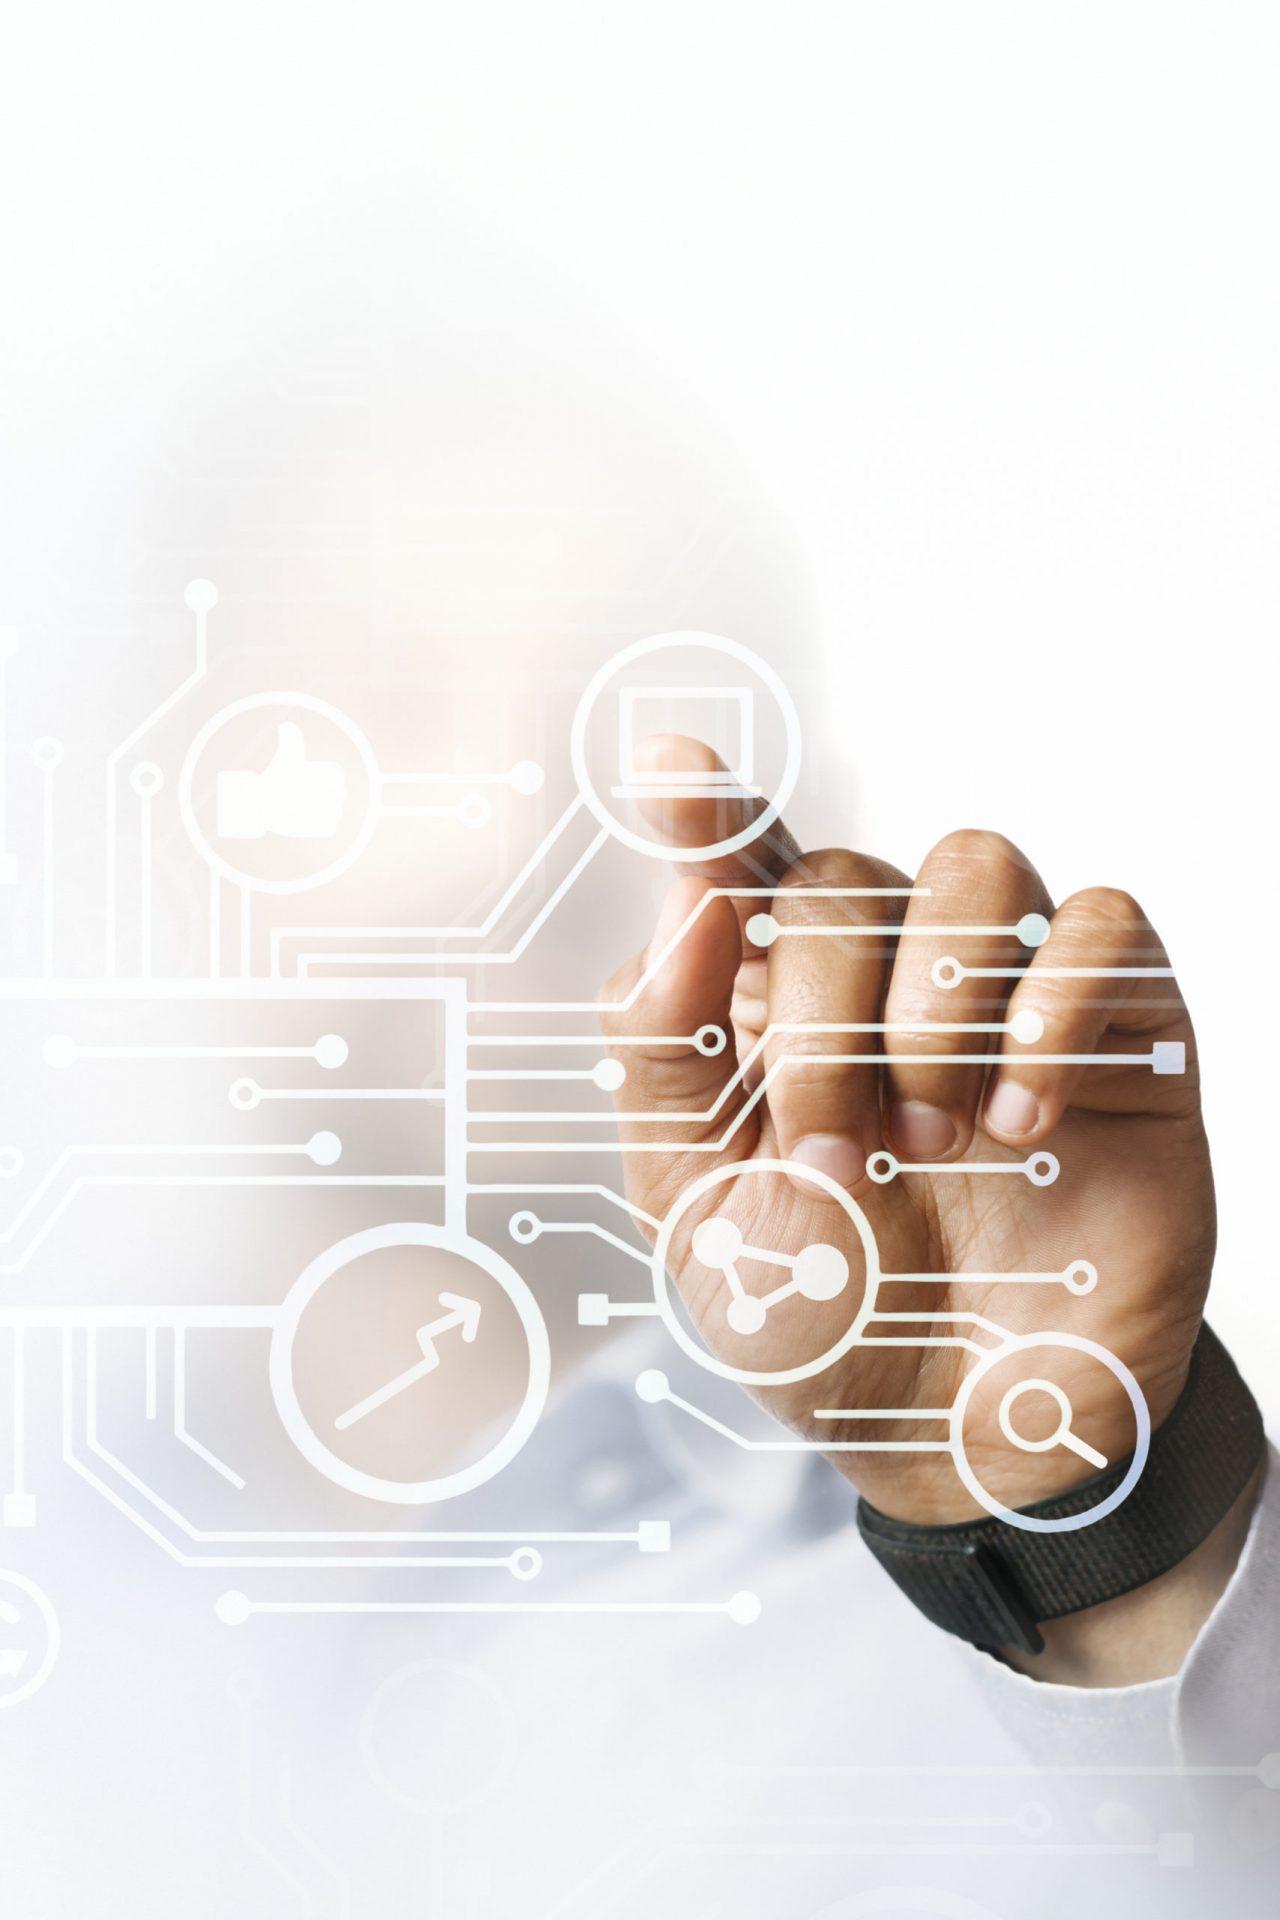 businessman-pointing-at-his-business-presentation-on-the-high-technology-digital-screen-scaled-1 Индустрия 4.0: почему предприятиям необходима цифровая трансформация